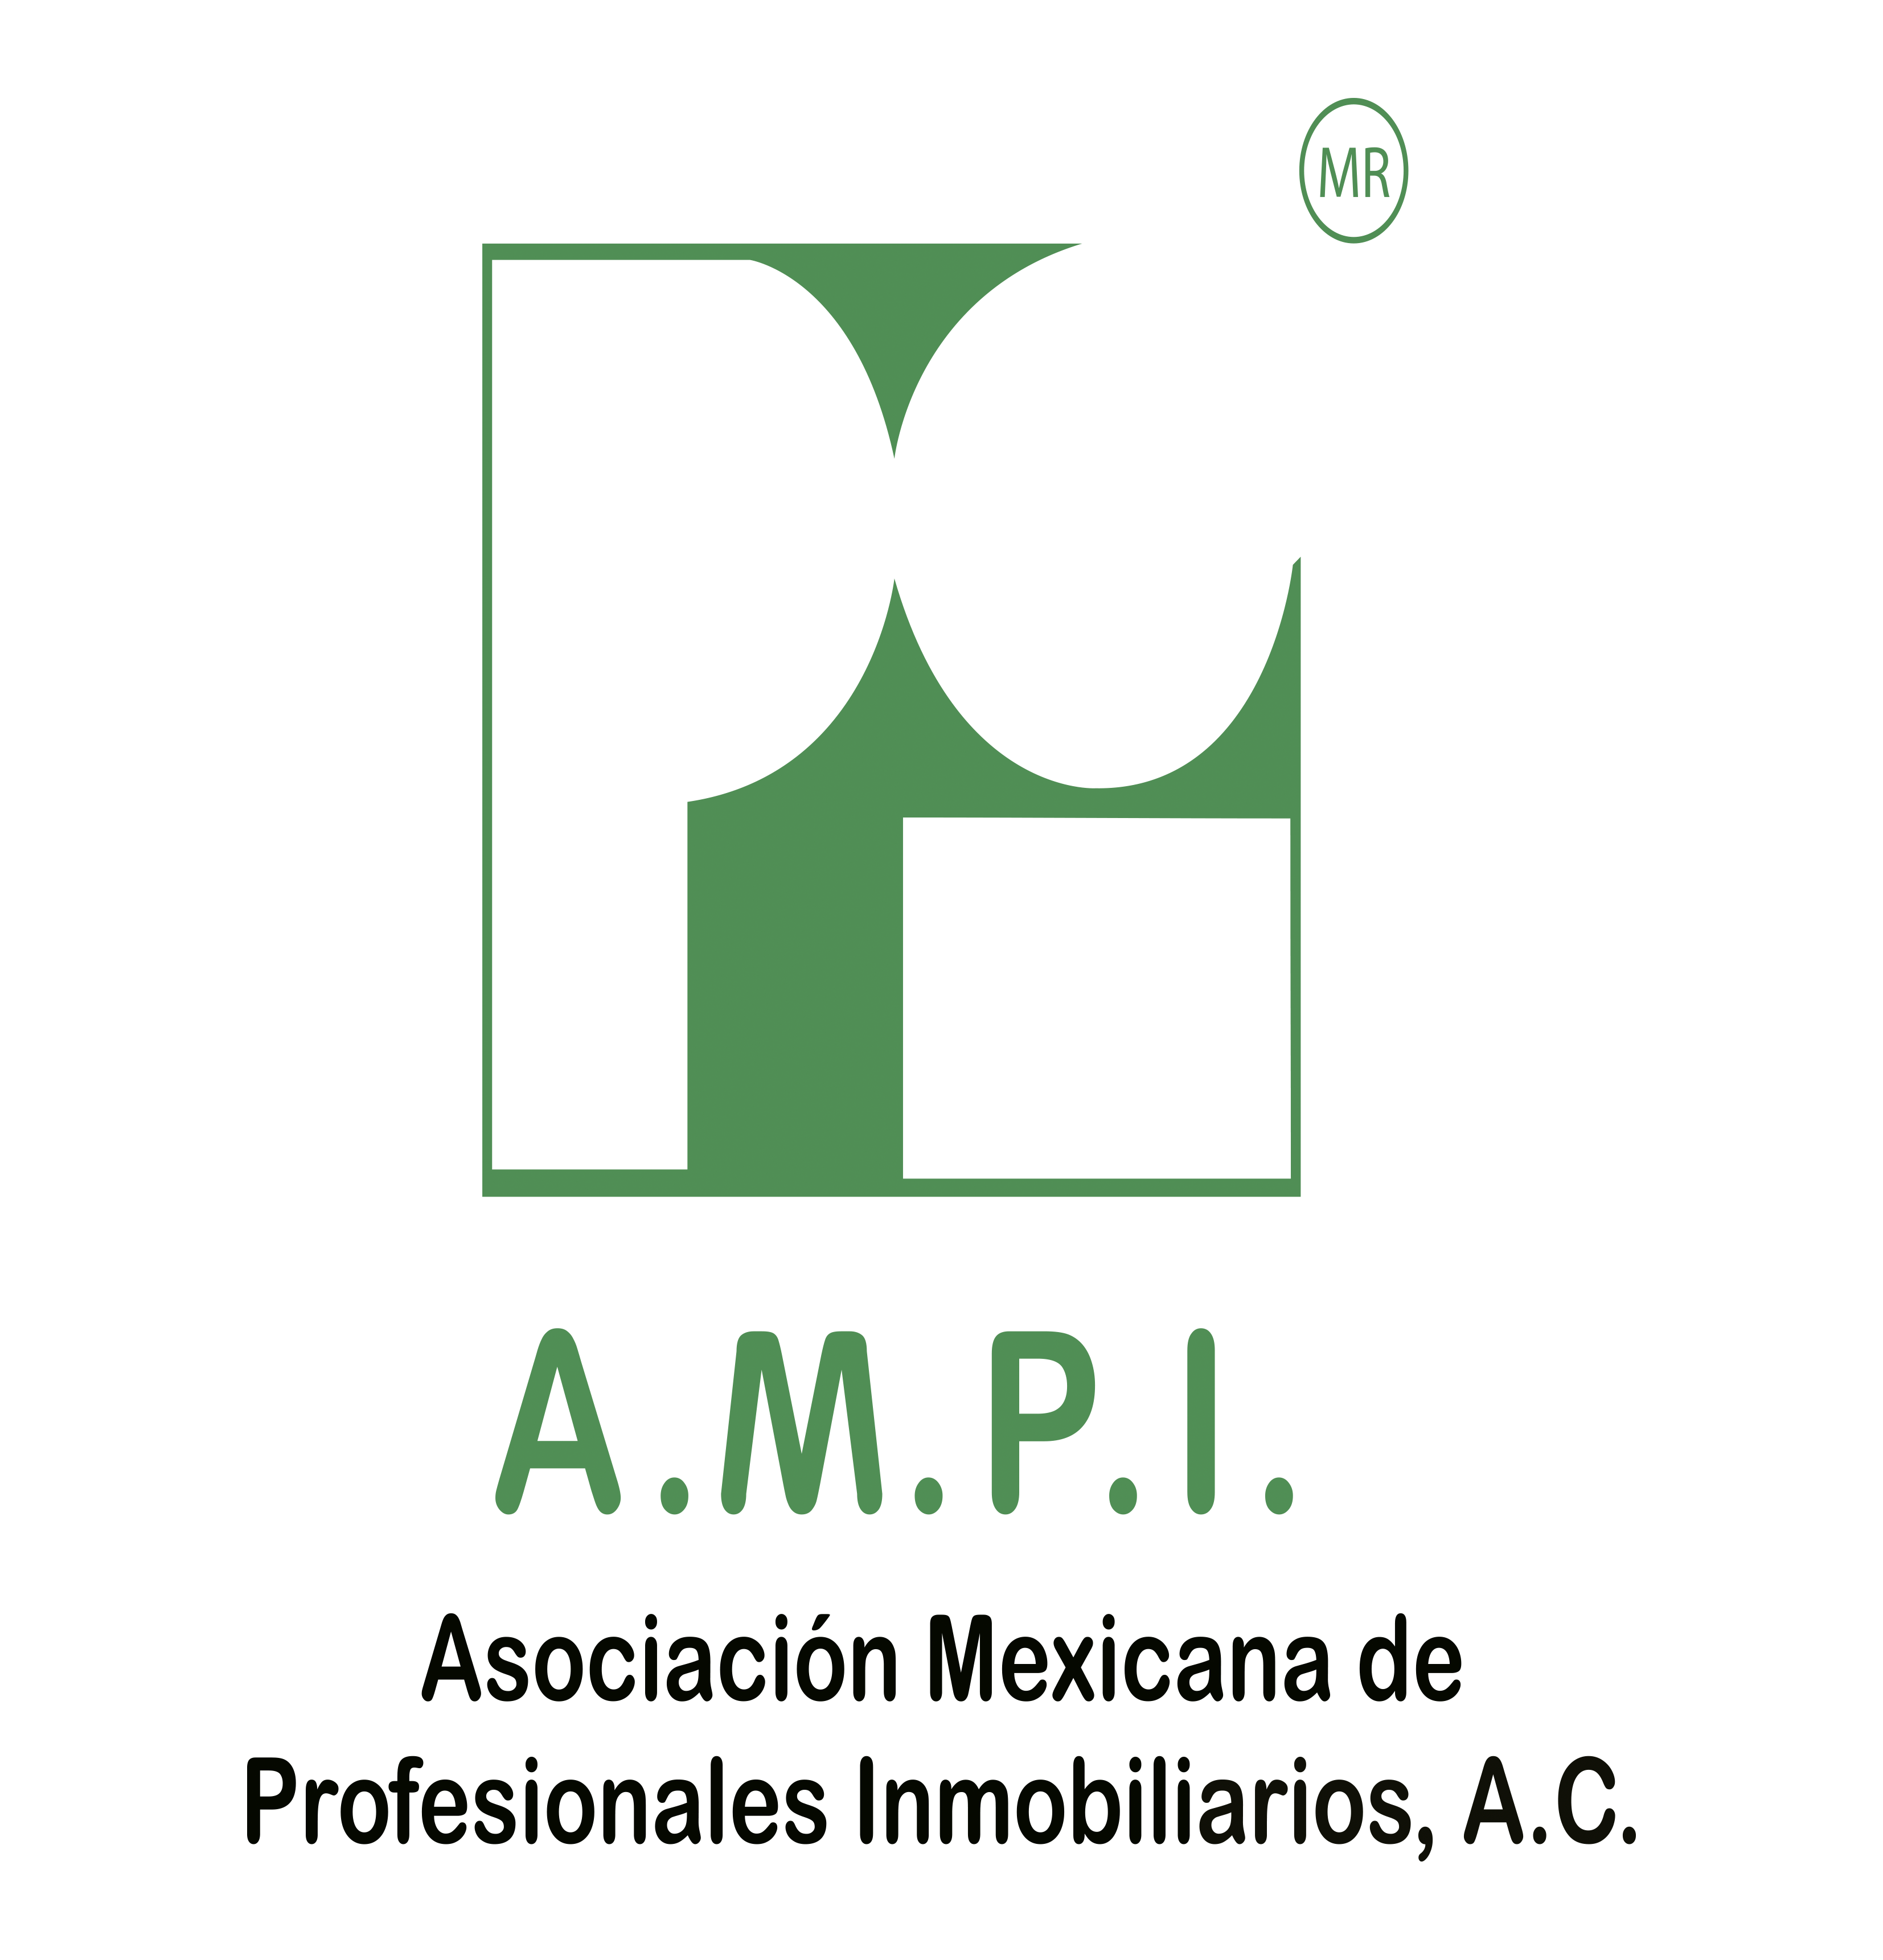 LOGO_AMPI_NEGRO_C_VERDE__1_.png